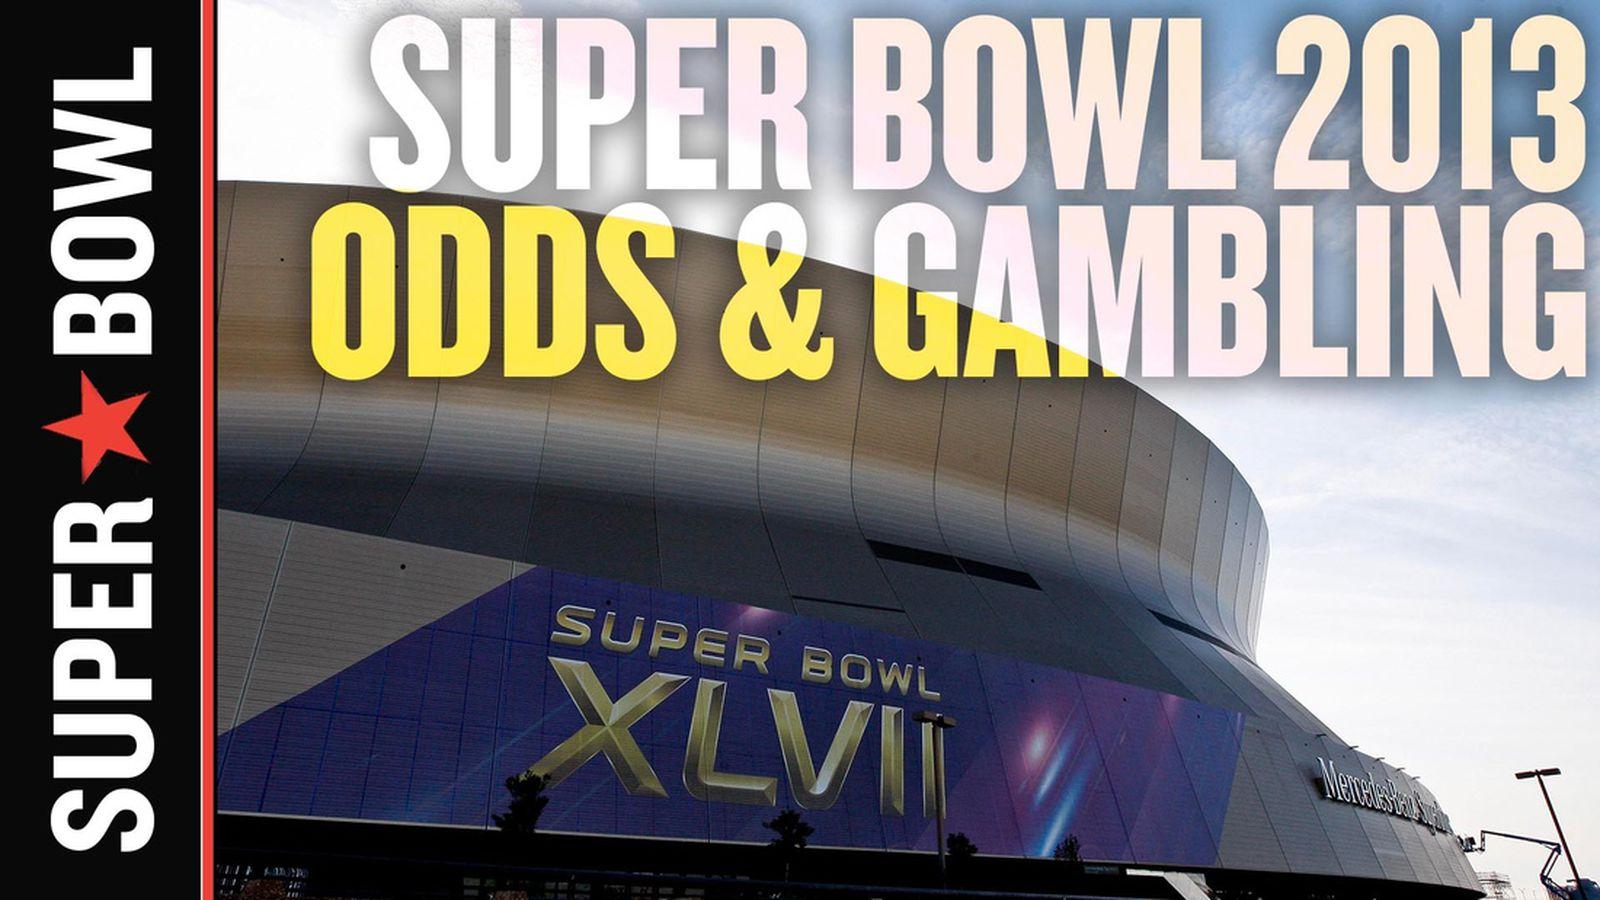 Super Bowl Odds 2013: Every Bet Imaginable - Baltimore Beatdown